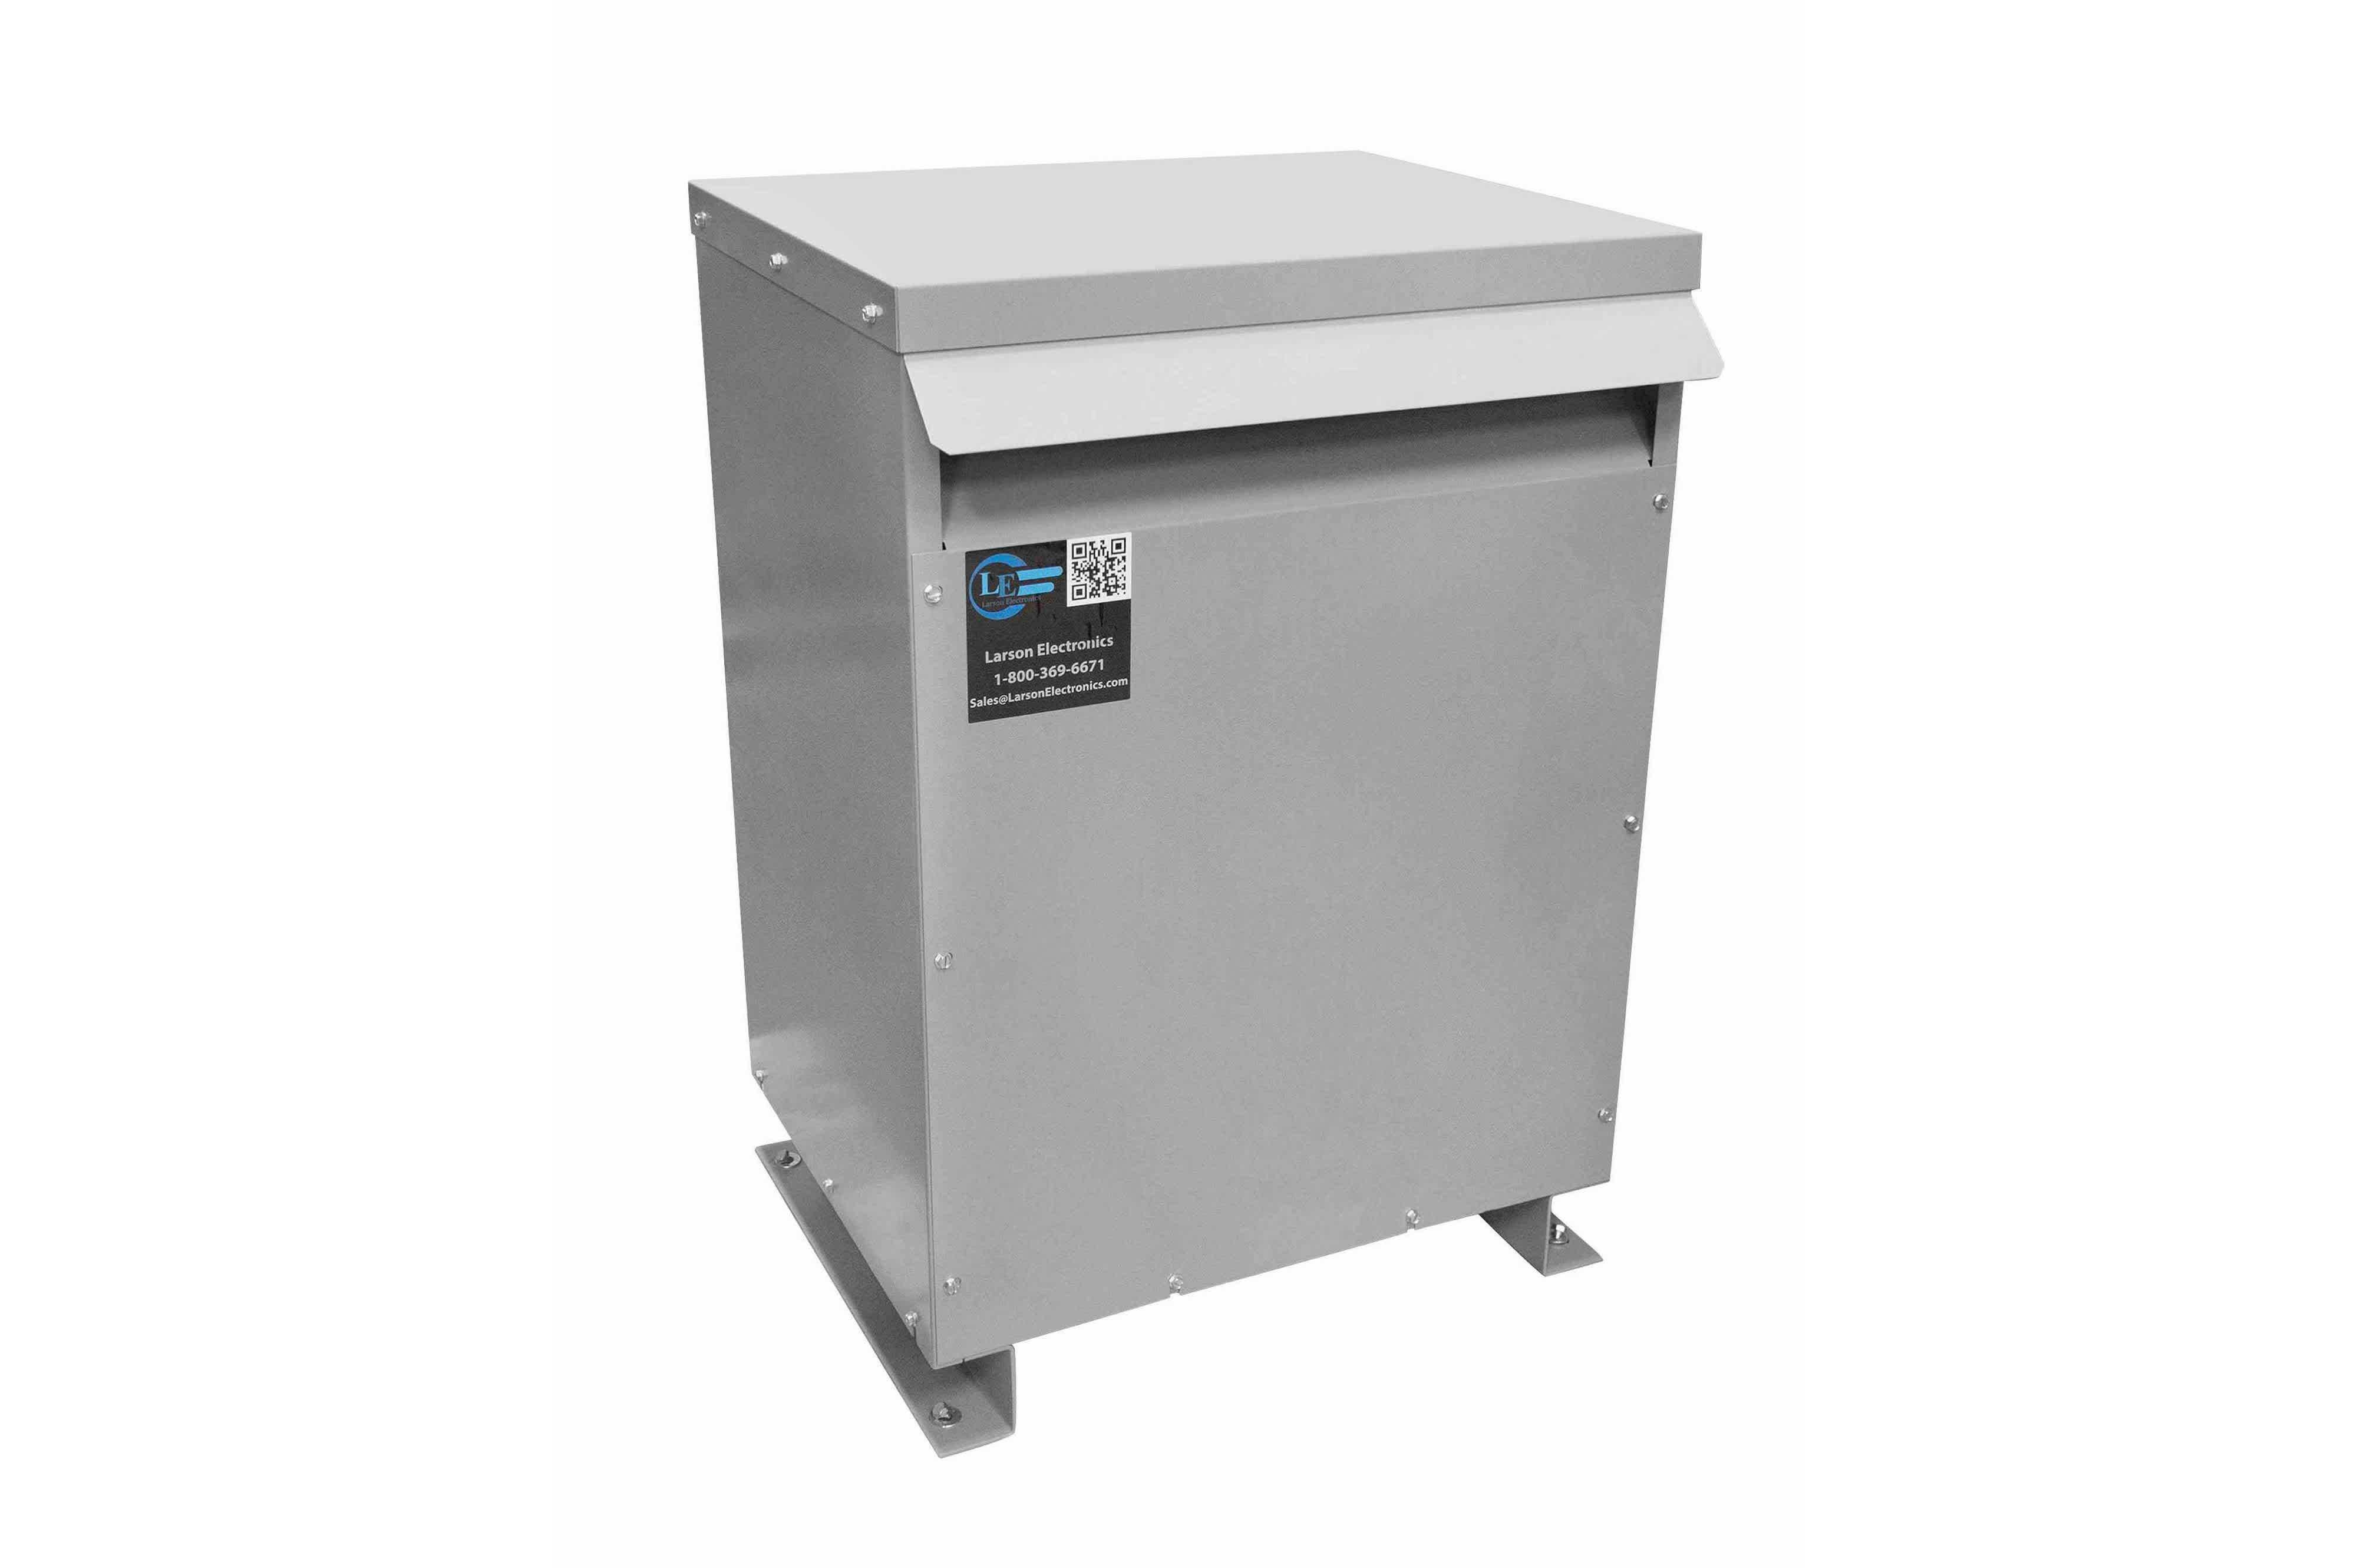 60 kVA 3PH Isolation Transformer, 240V Wye Primary, 380V Delta Secondary, N3R, Ventilated, 60 Hz